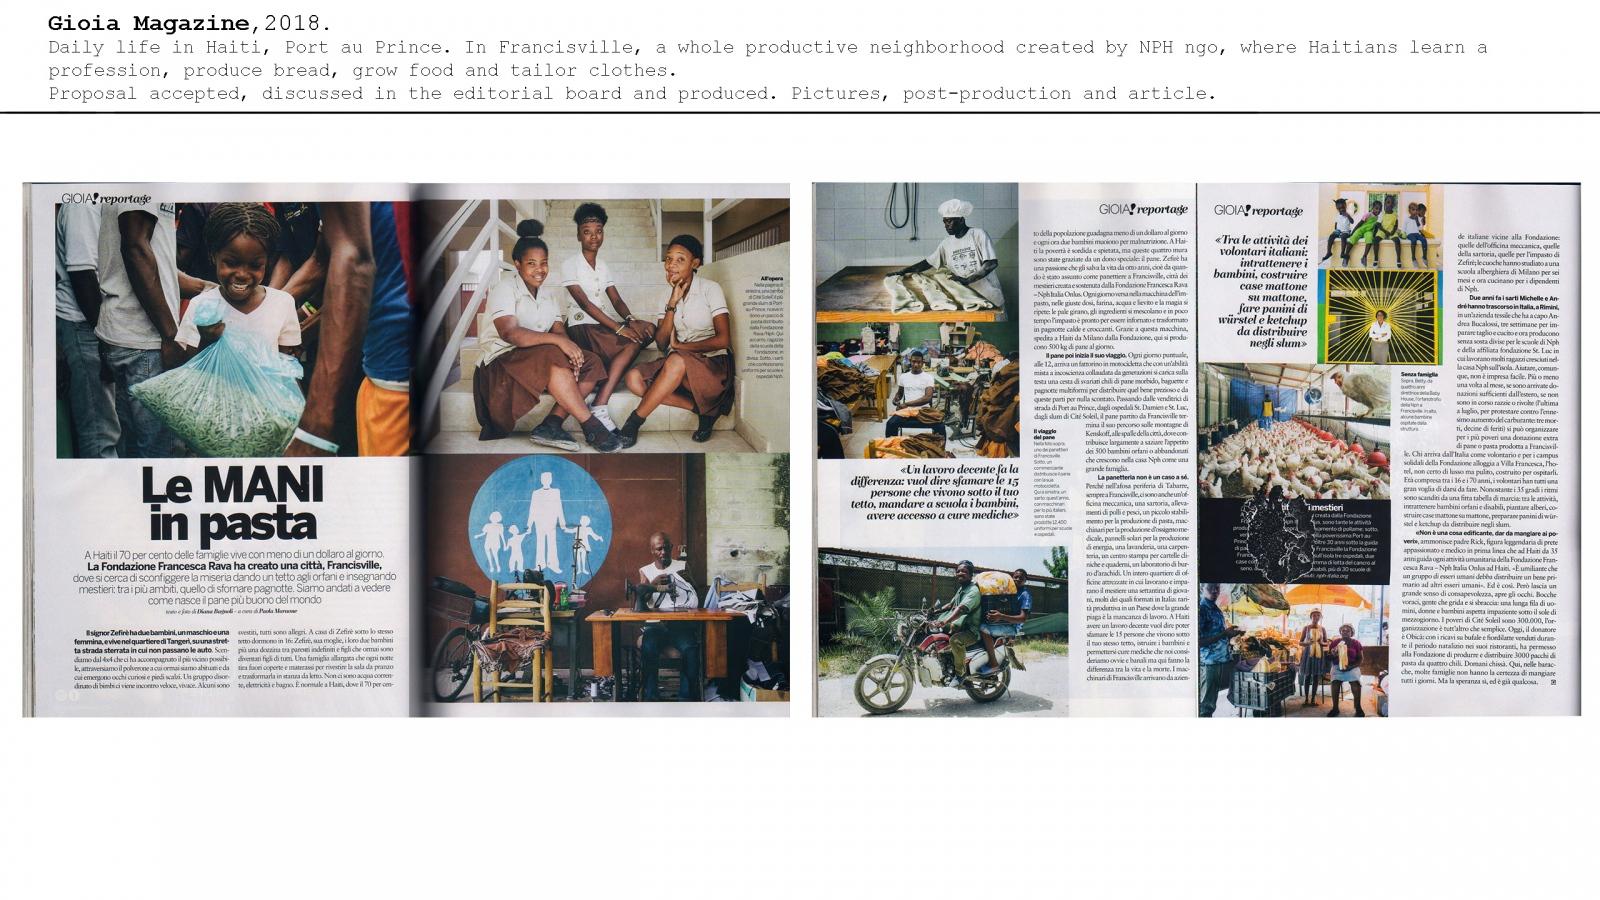 news, tearsheets, magazines, editorials